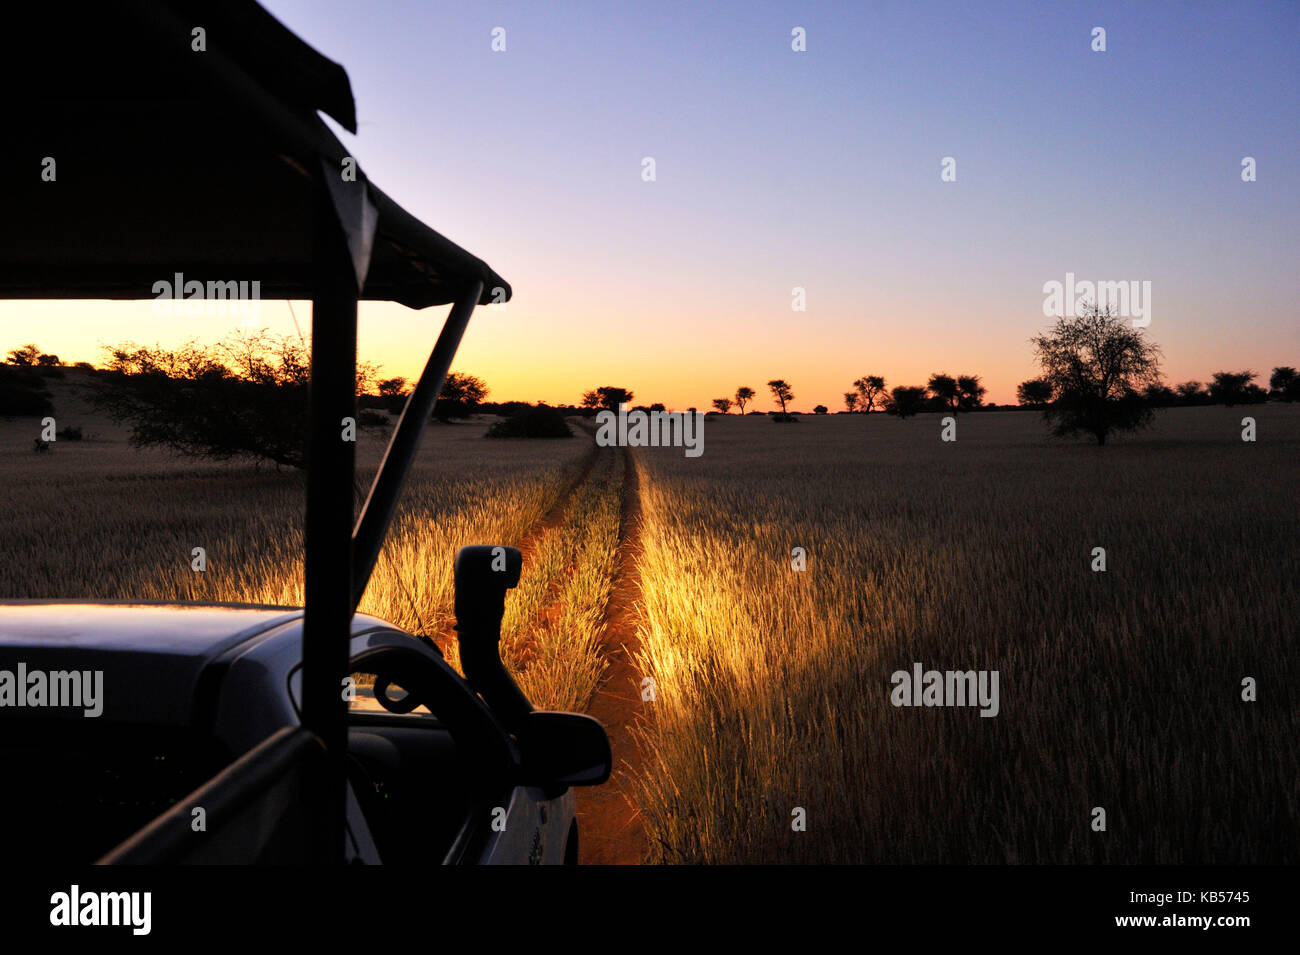 Namibia, Kalahari desert, Intu Africa Kalahari game reserve, night safari - Stock Image